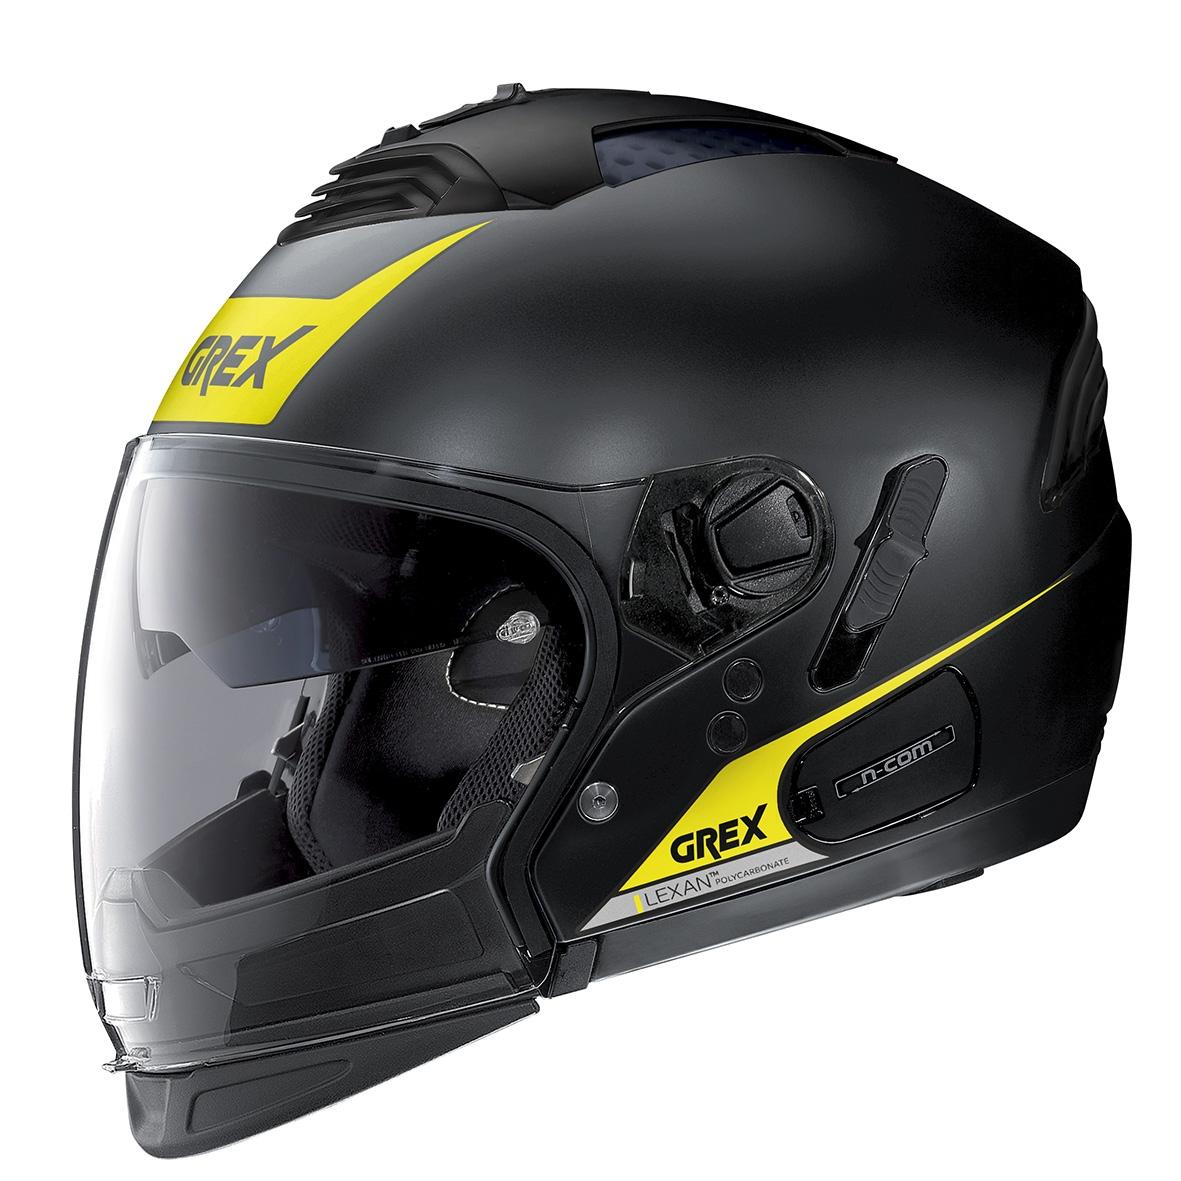 Moto helma Grex G4.2 PRO Vivid N-Com Flat Black 33